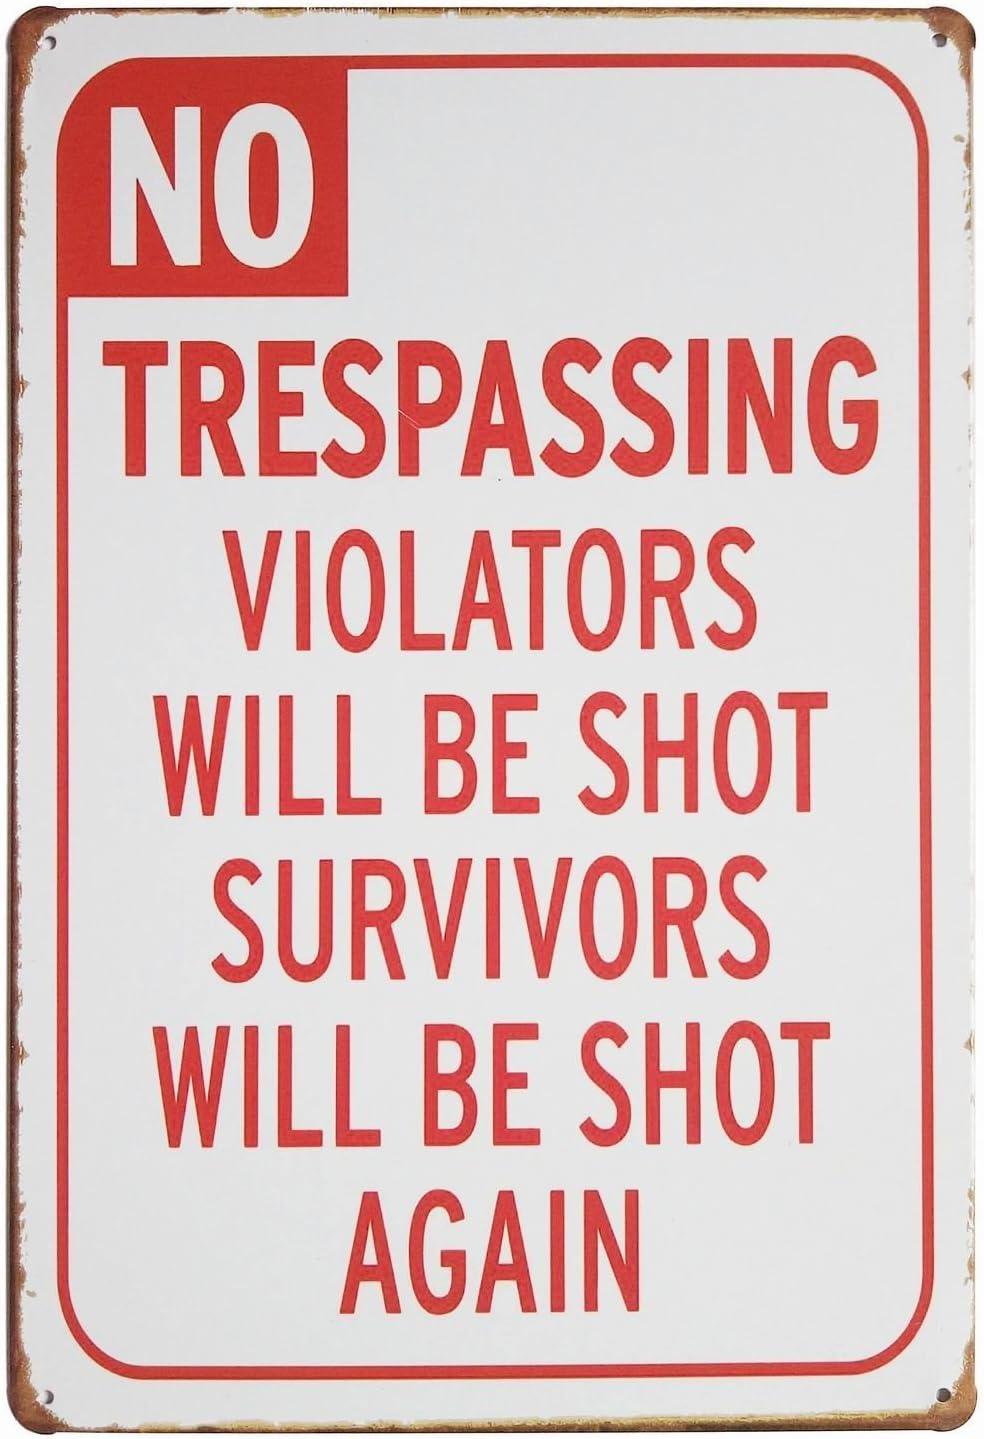 ARTCLUB No Trespassing Violators Will Be Shoot Retro Vintage Tin Sign Fun Saying Wall Decor